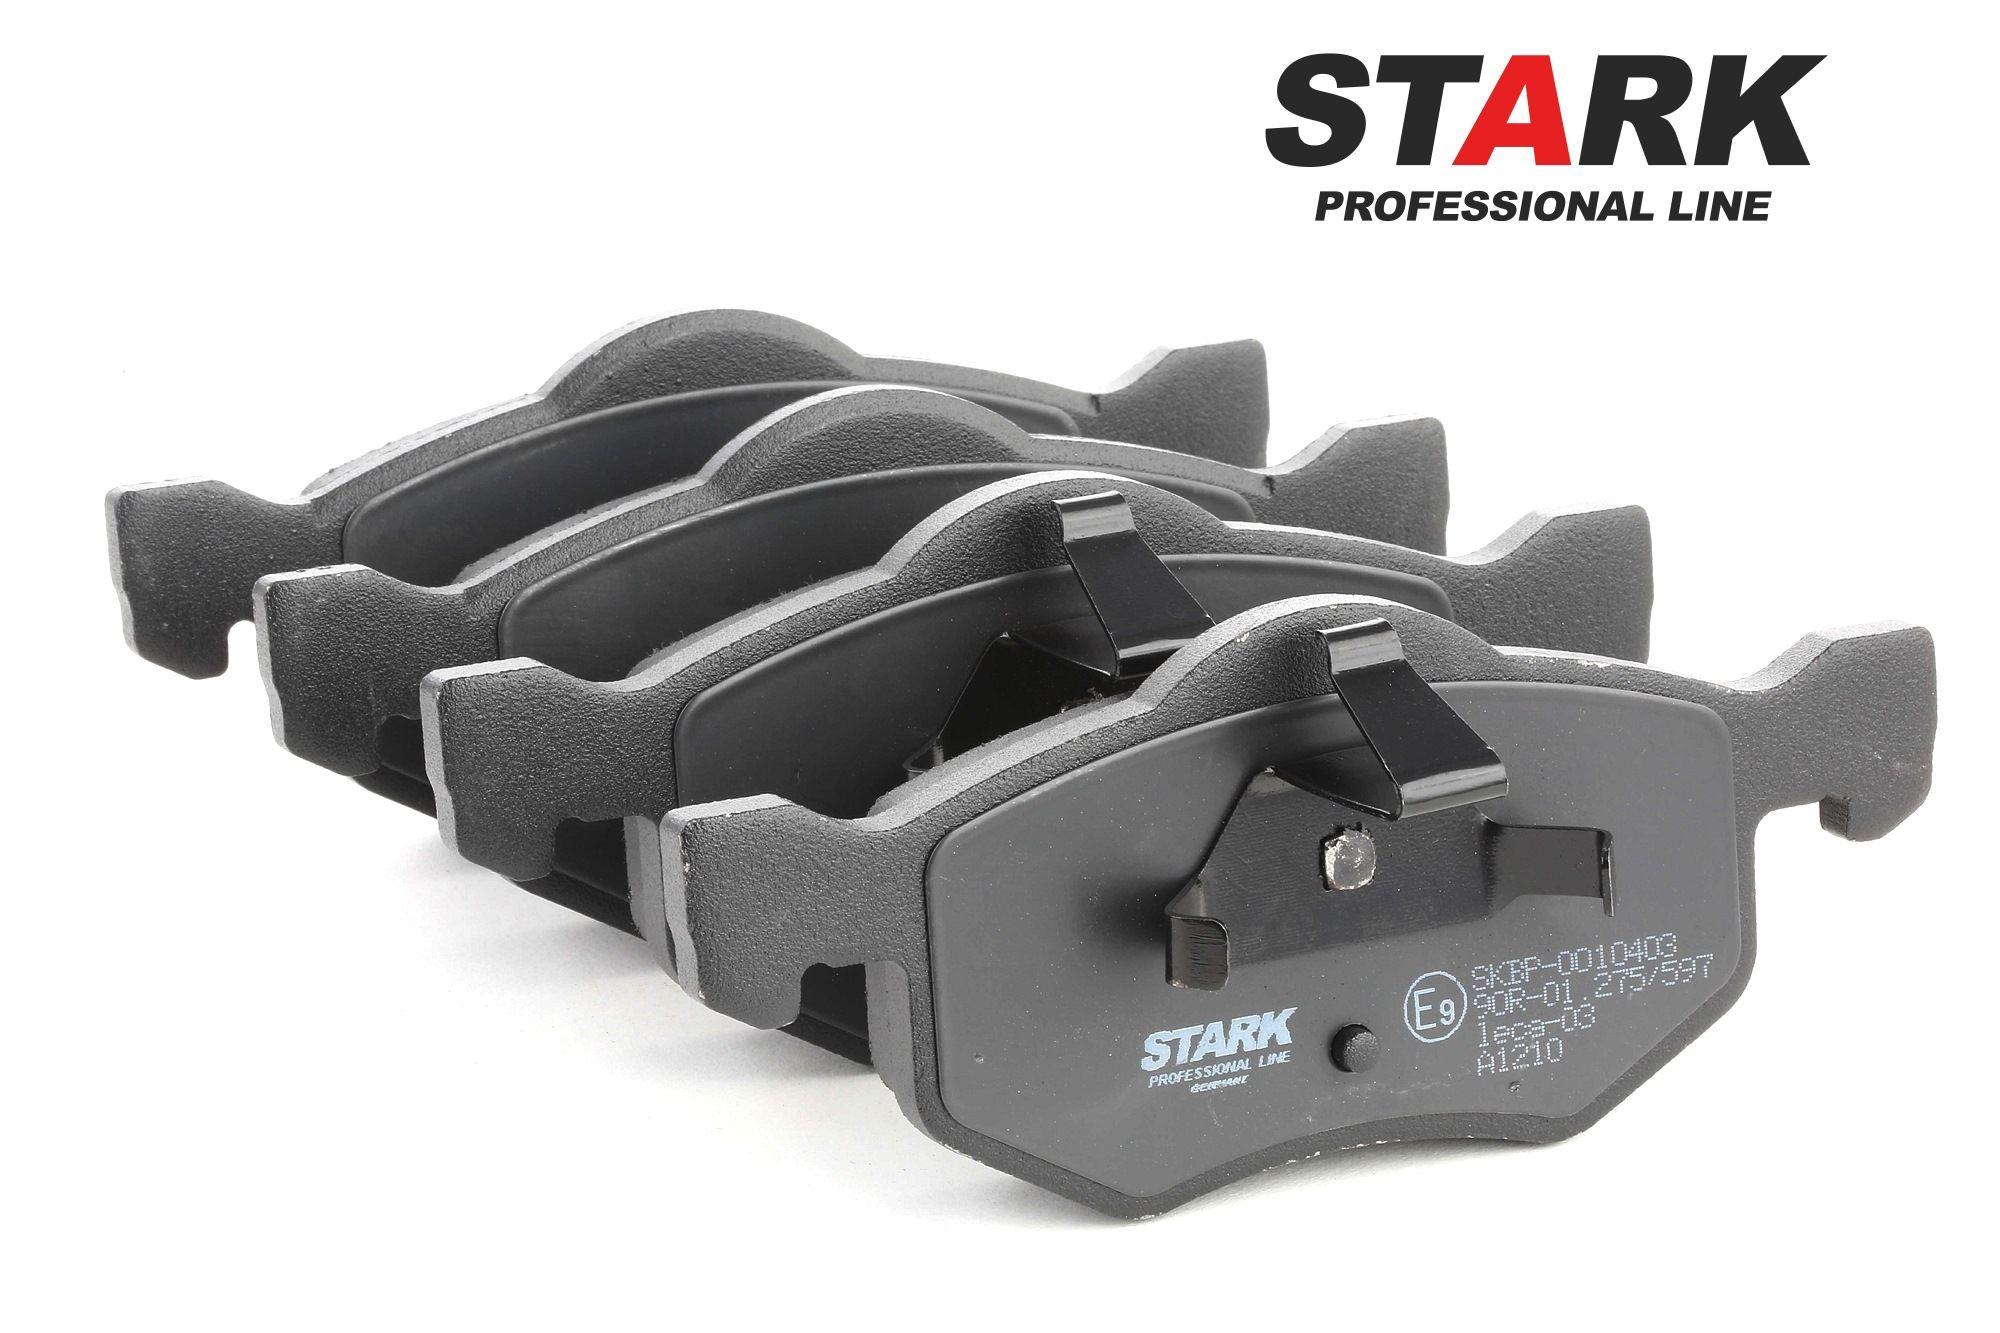 FORD USA ESCAPE 2011 Bremsbelagsatz - Original STARK SKBP-0010403 Höhe: 66,5mm, Breite: 156,3mm, Dicke/Stärke: 18,3mm